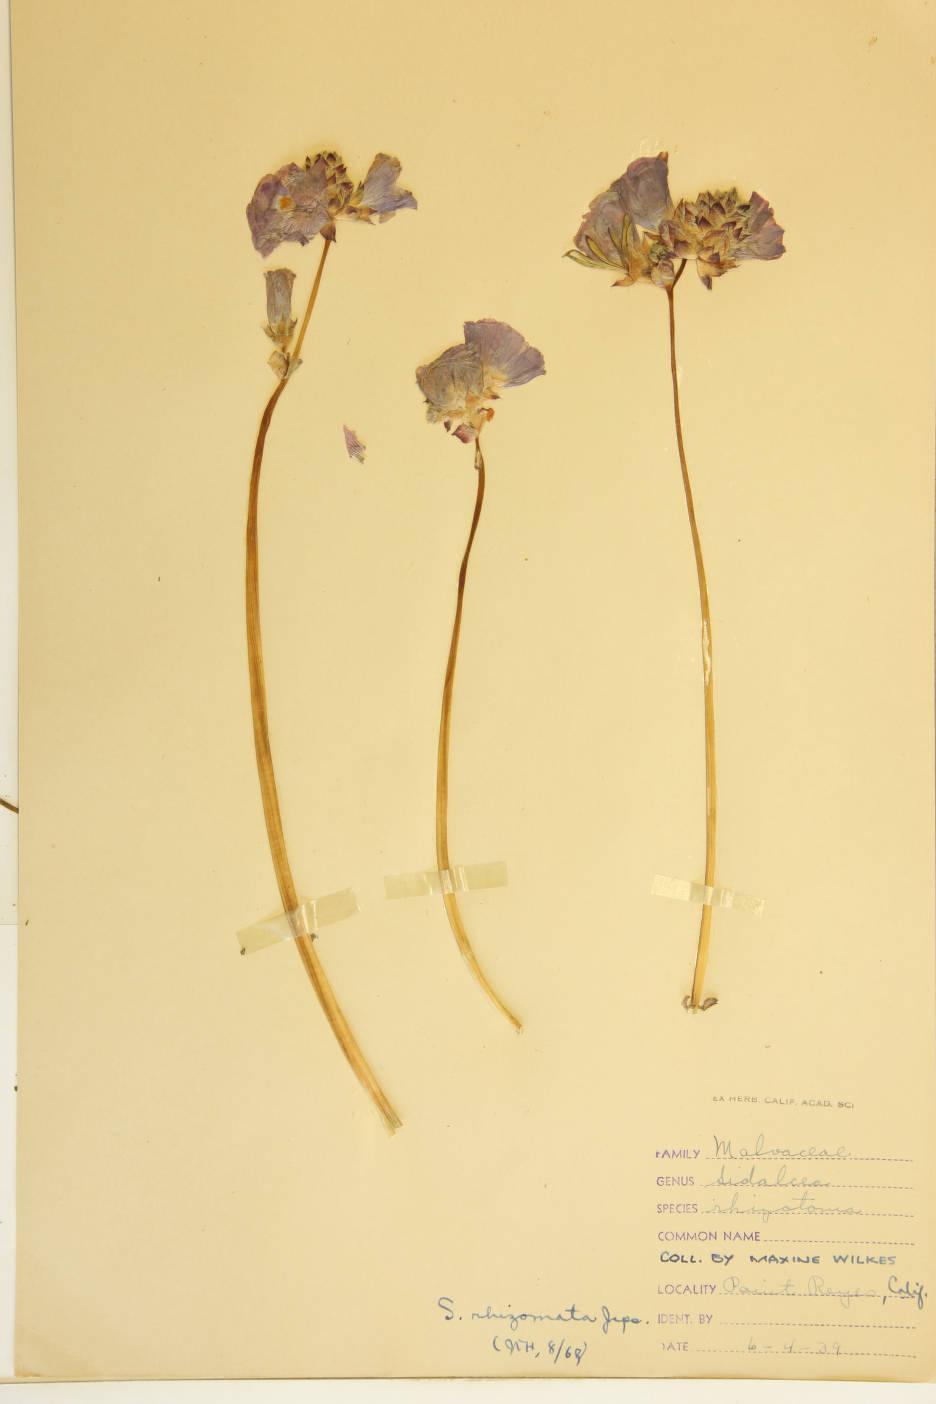 Image of Sidalcea rhizomata